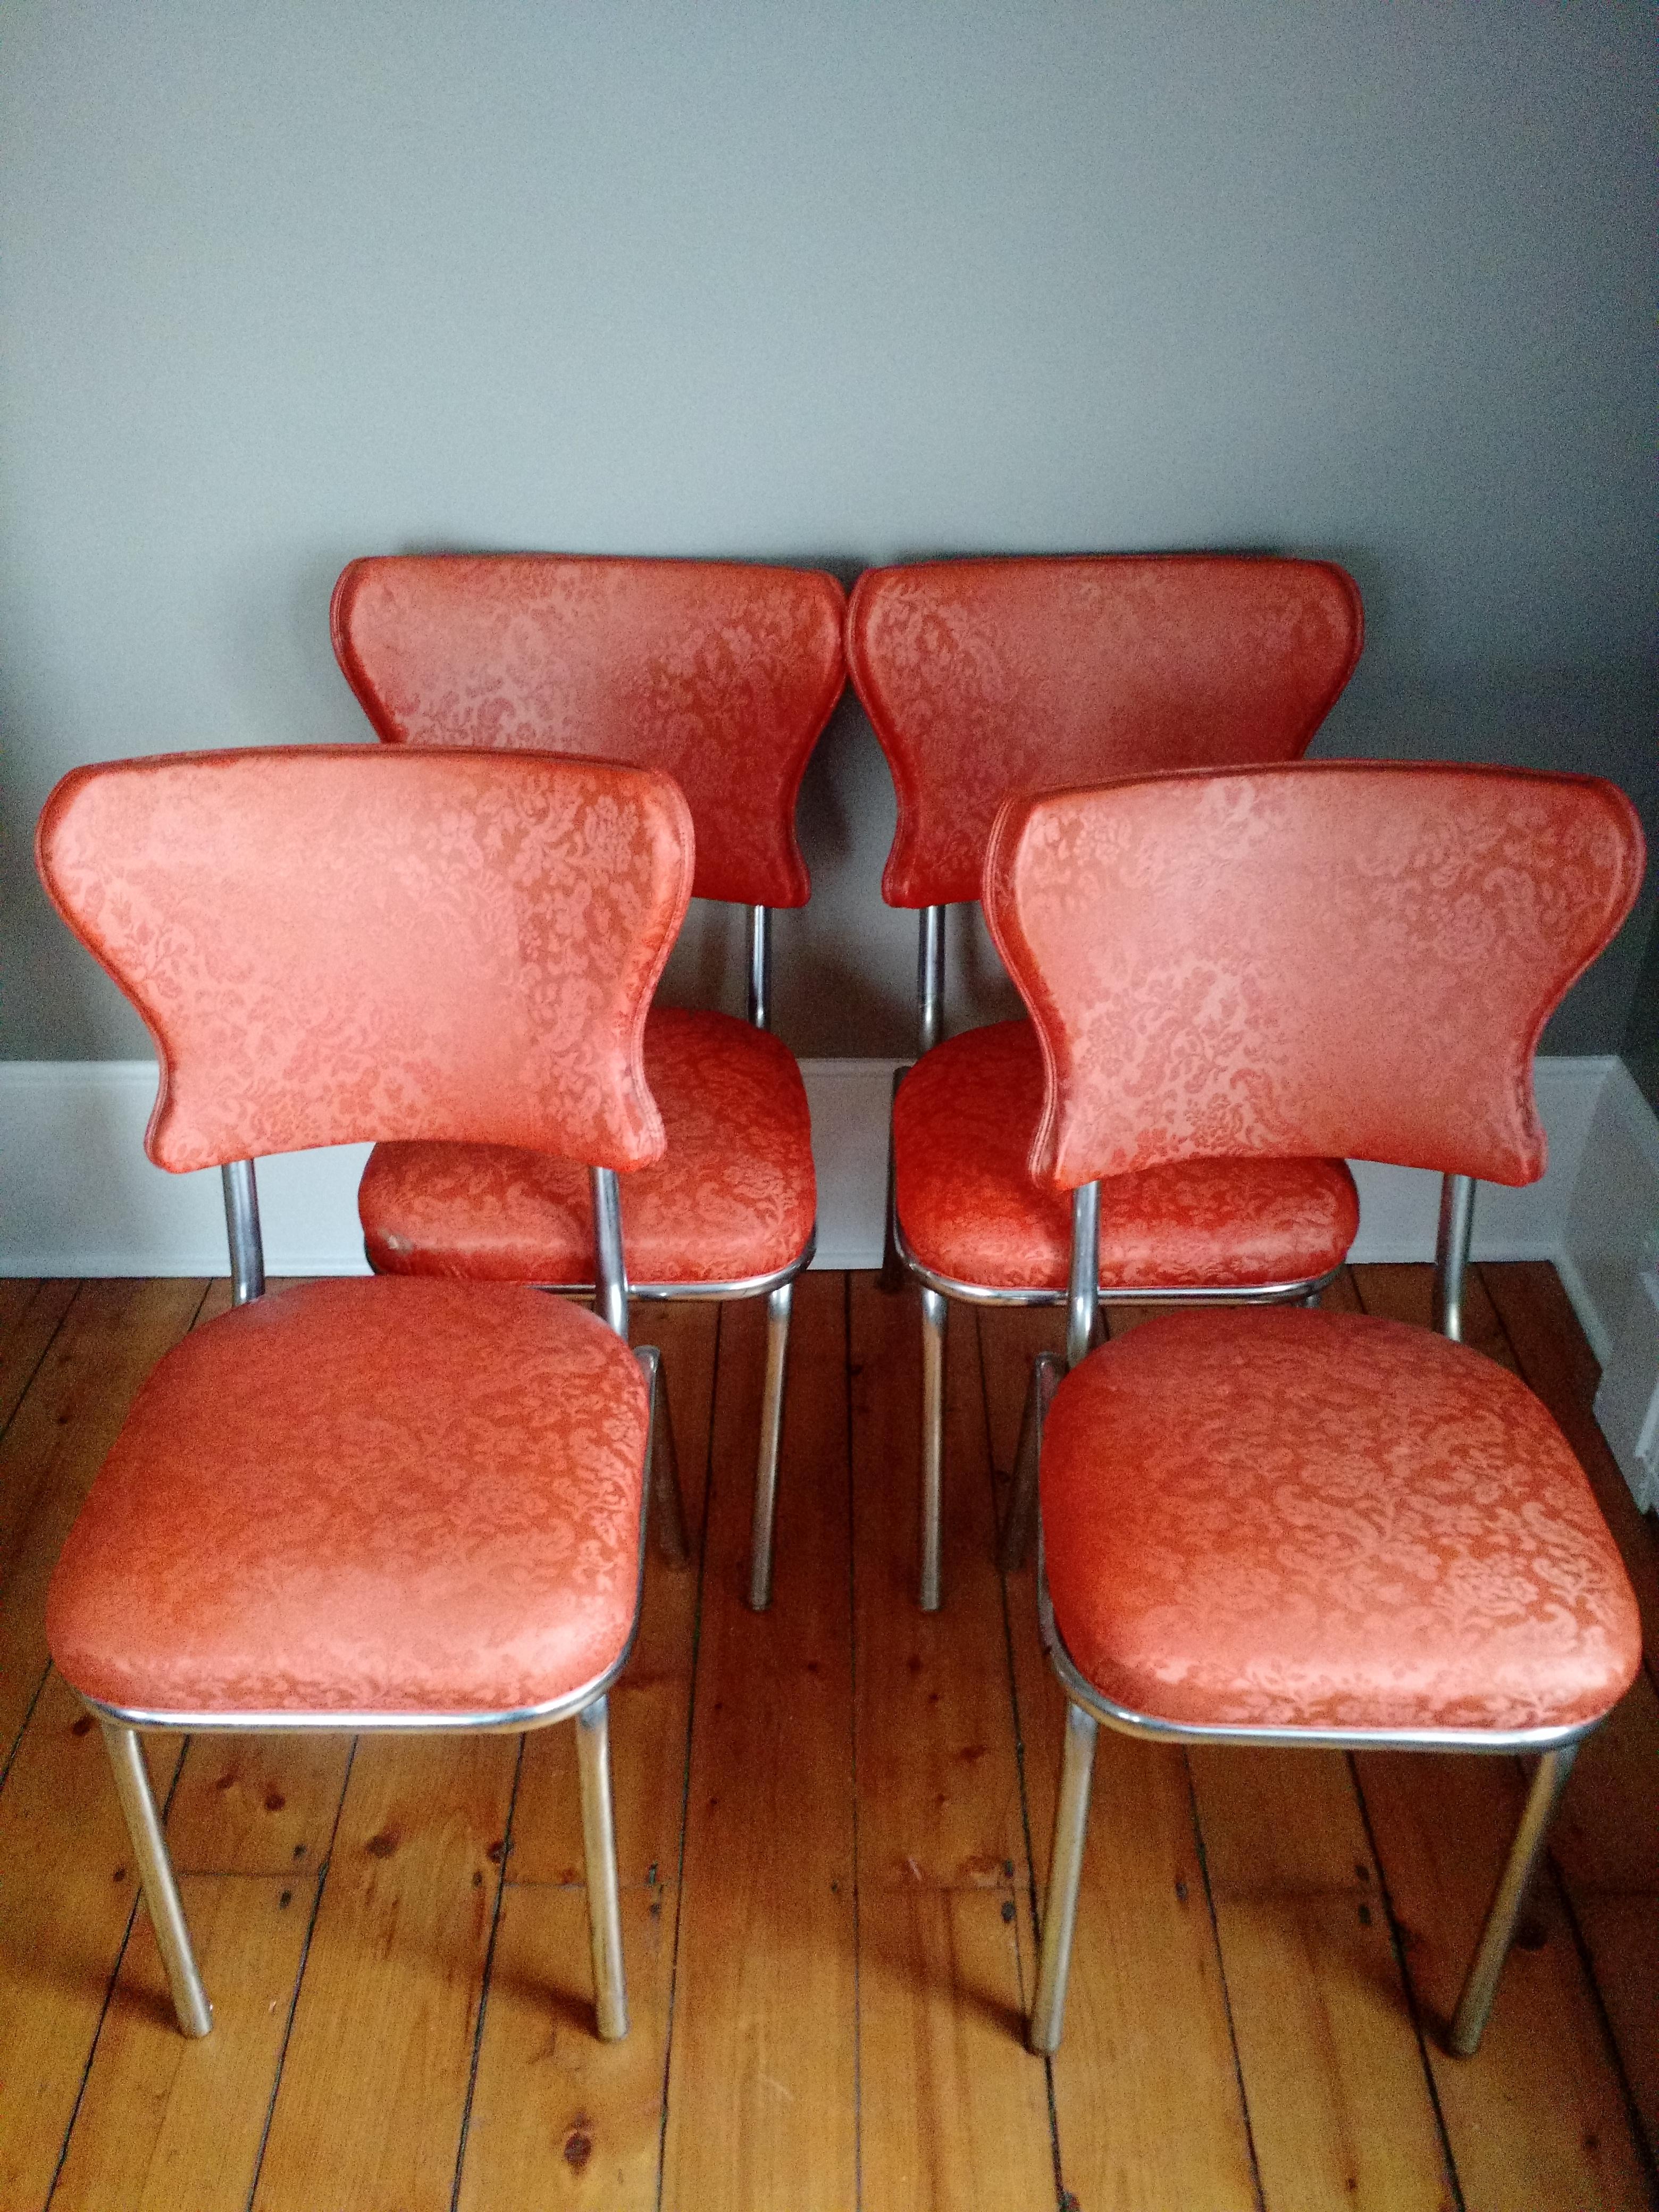 retro chrome chairs lounge chair ottoman 1950s vinyl dining set of 4 chairish authentic orange kitchenette one has